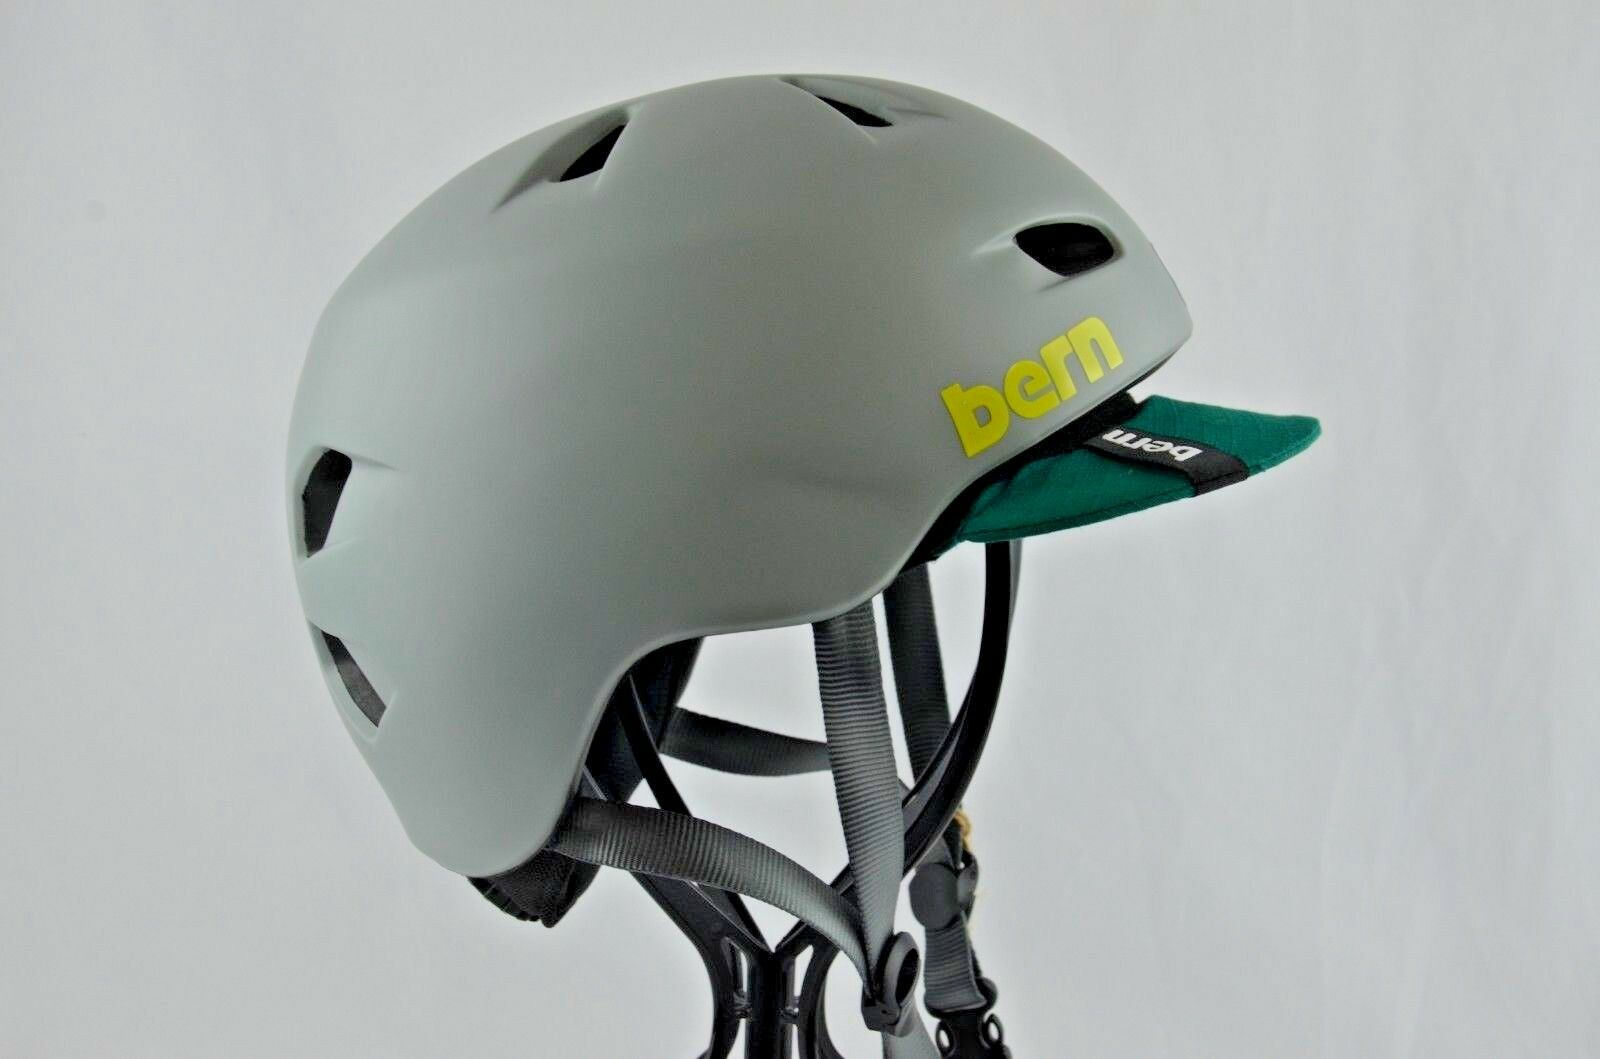 Bern Brentwood Zip Mold Bike Helmet Men's Flip Visor Small Matte Pavement